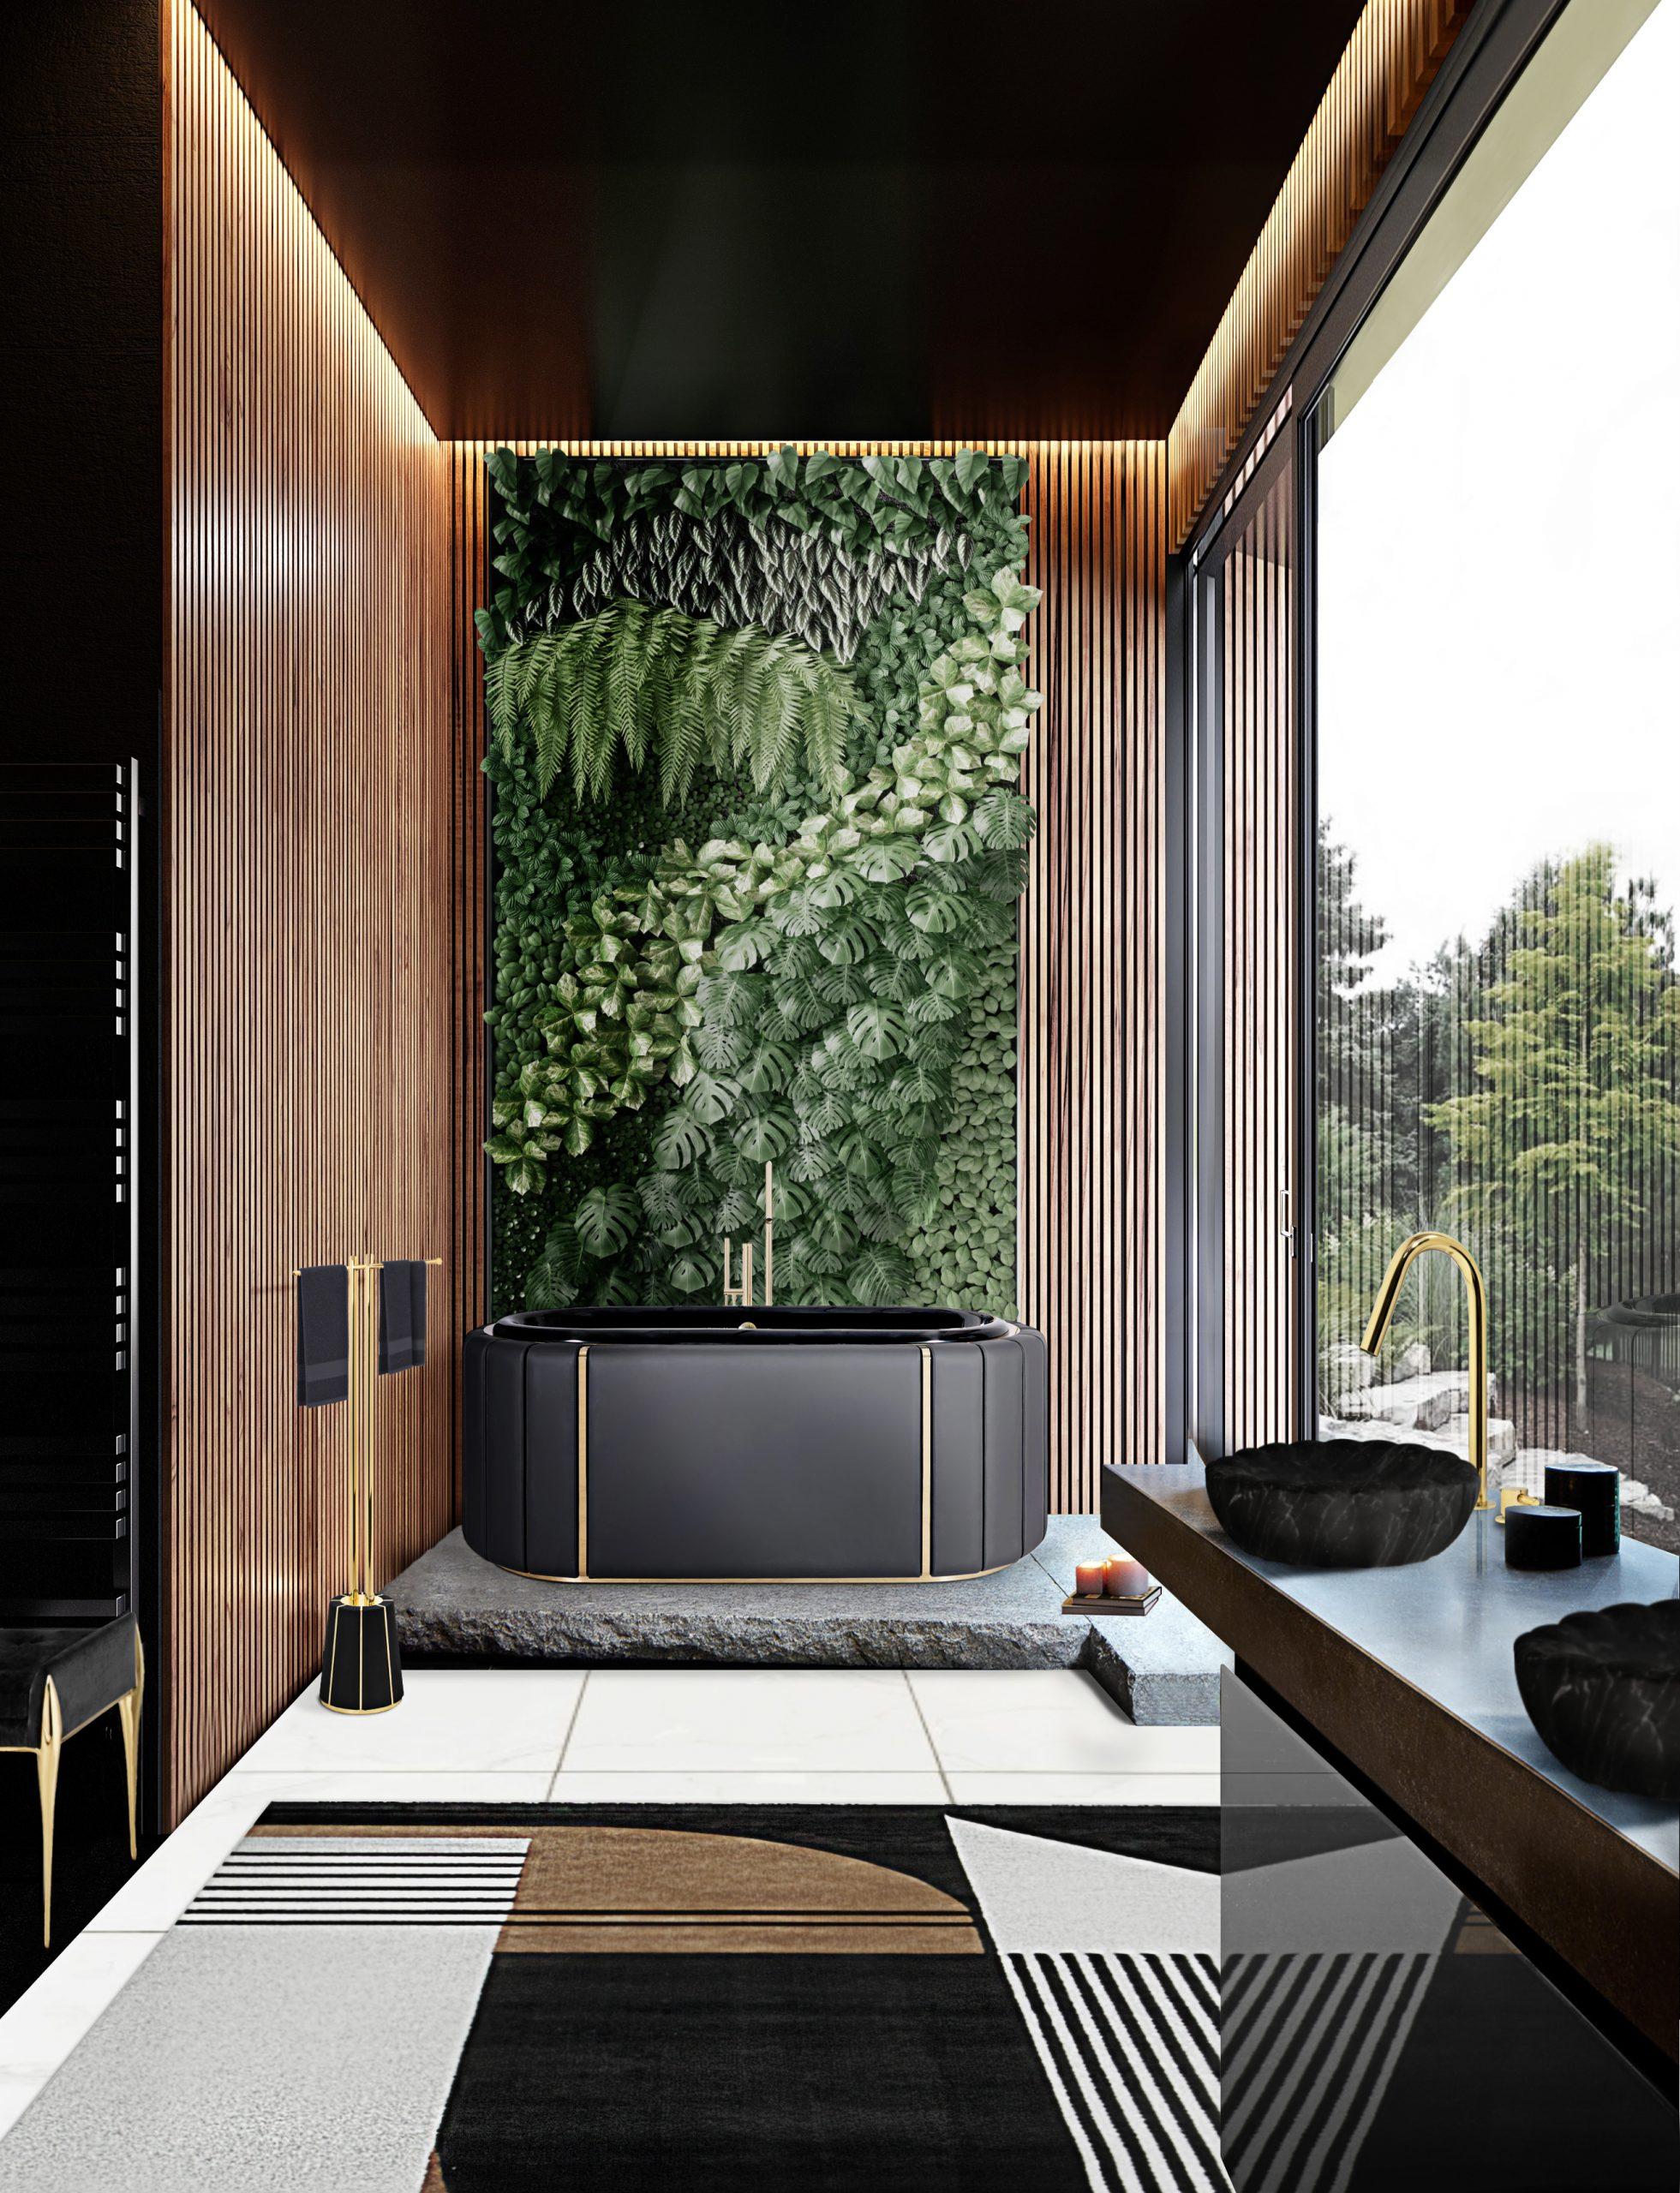 Maison-Valentina-Top-10-Expensive-Furniture-Brands